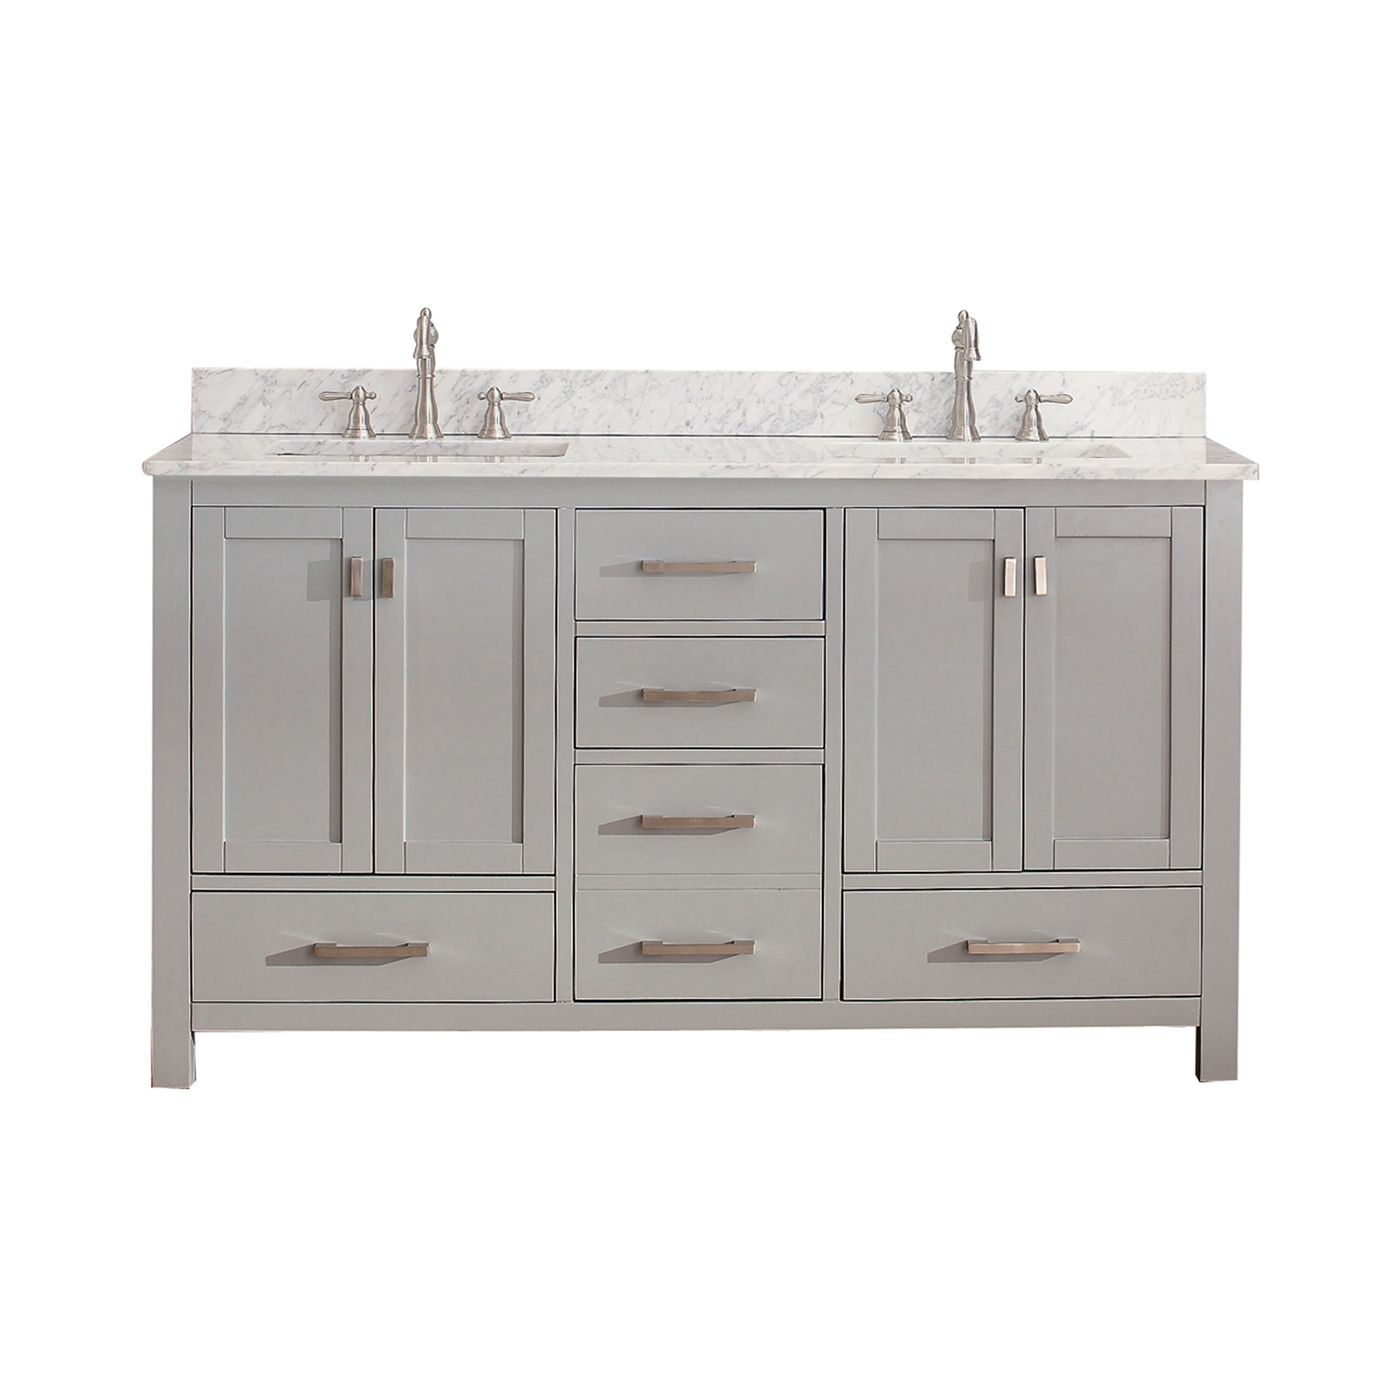 5 foot double sink vanity. Ancerre Designs Kayleigh Sapphire Gray  Common 60 In X 22 Undermount Double Sink Birch Bathroom Vanity With Natural Marble Top Vanities And